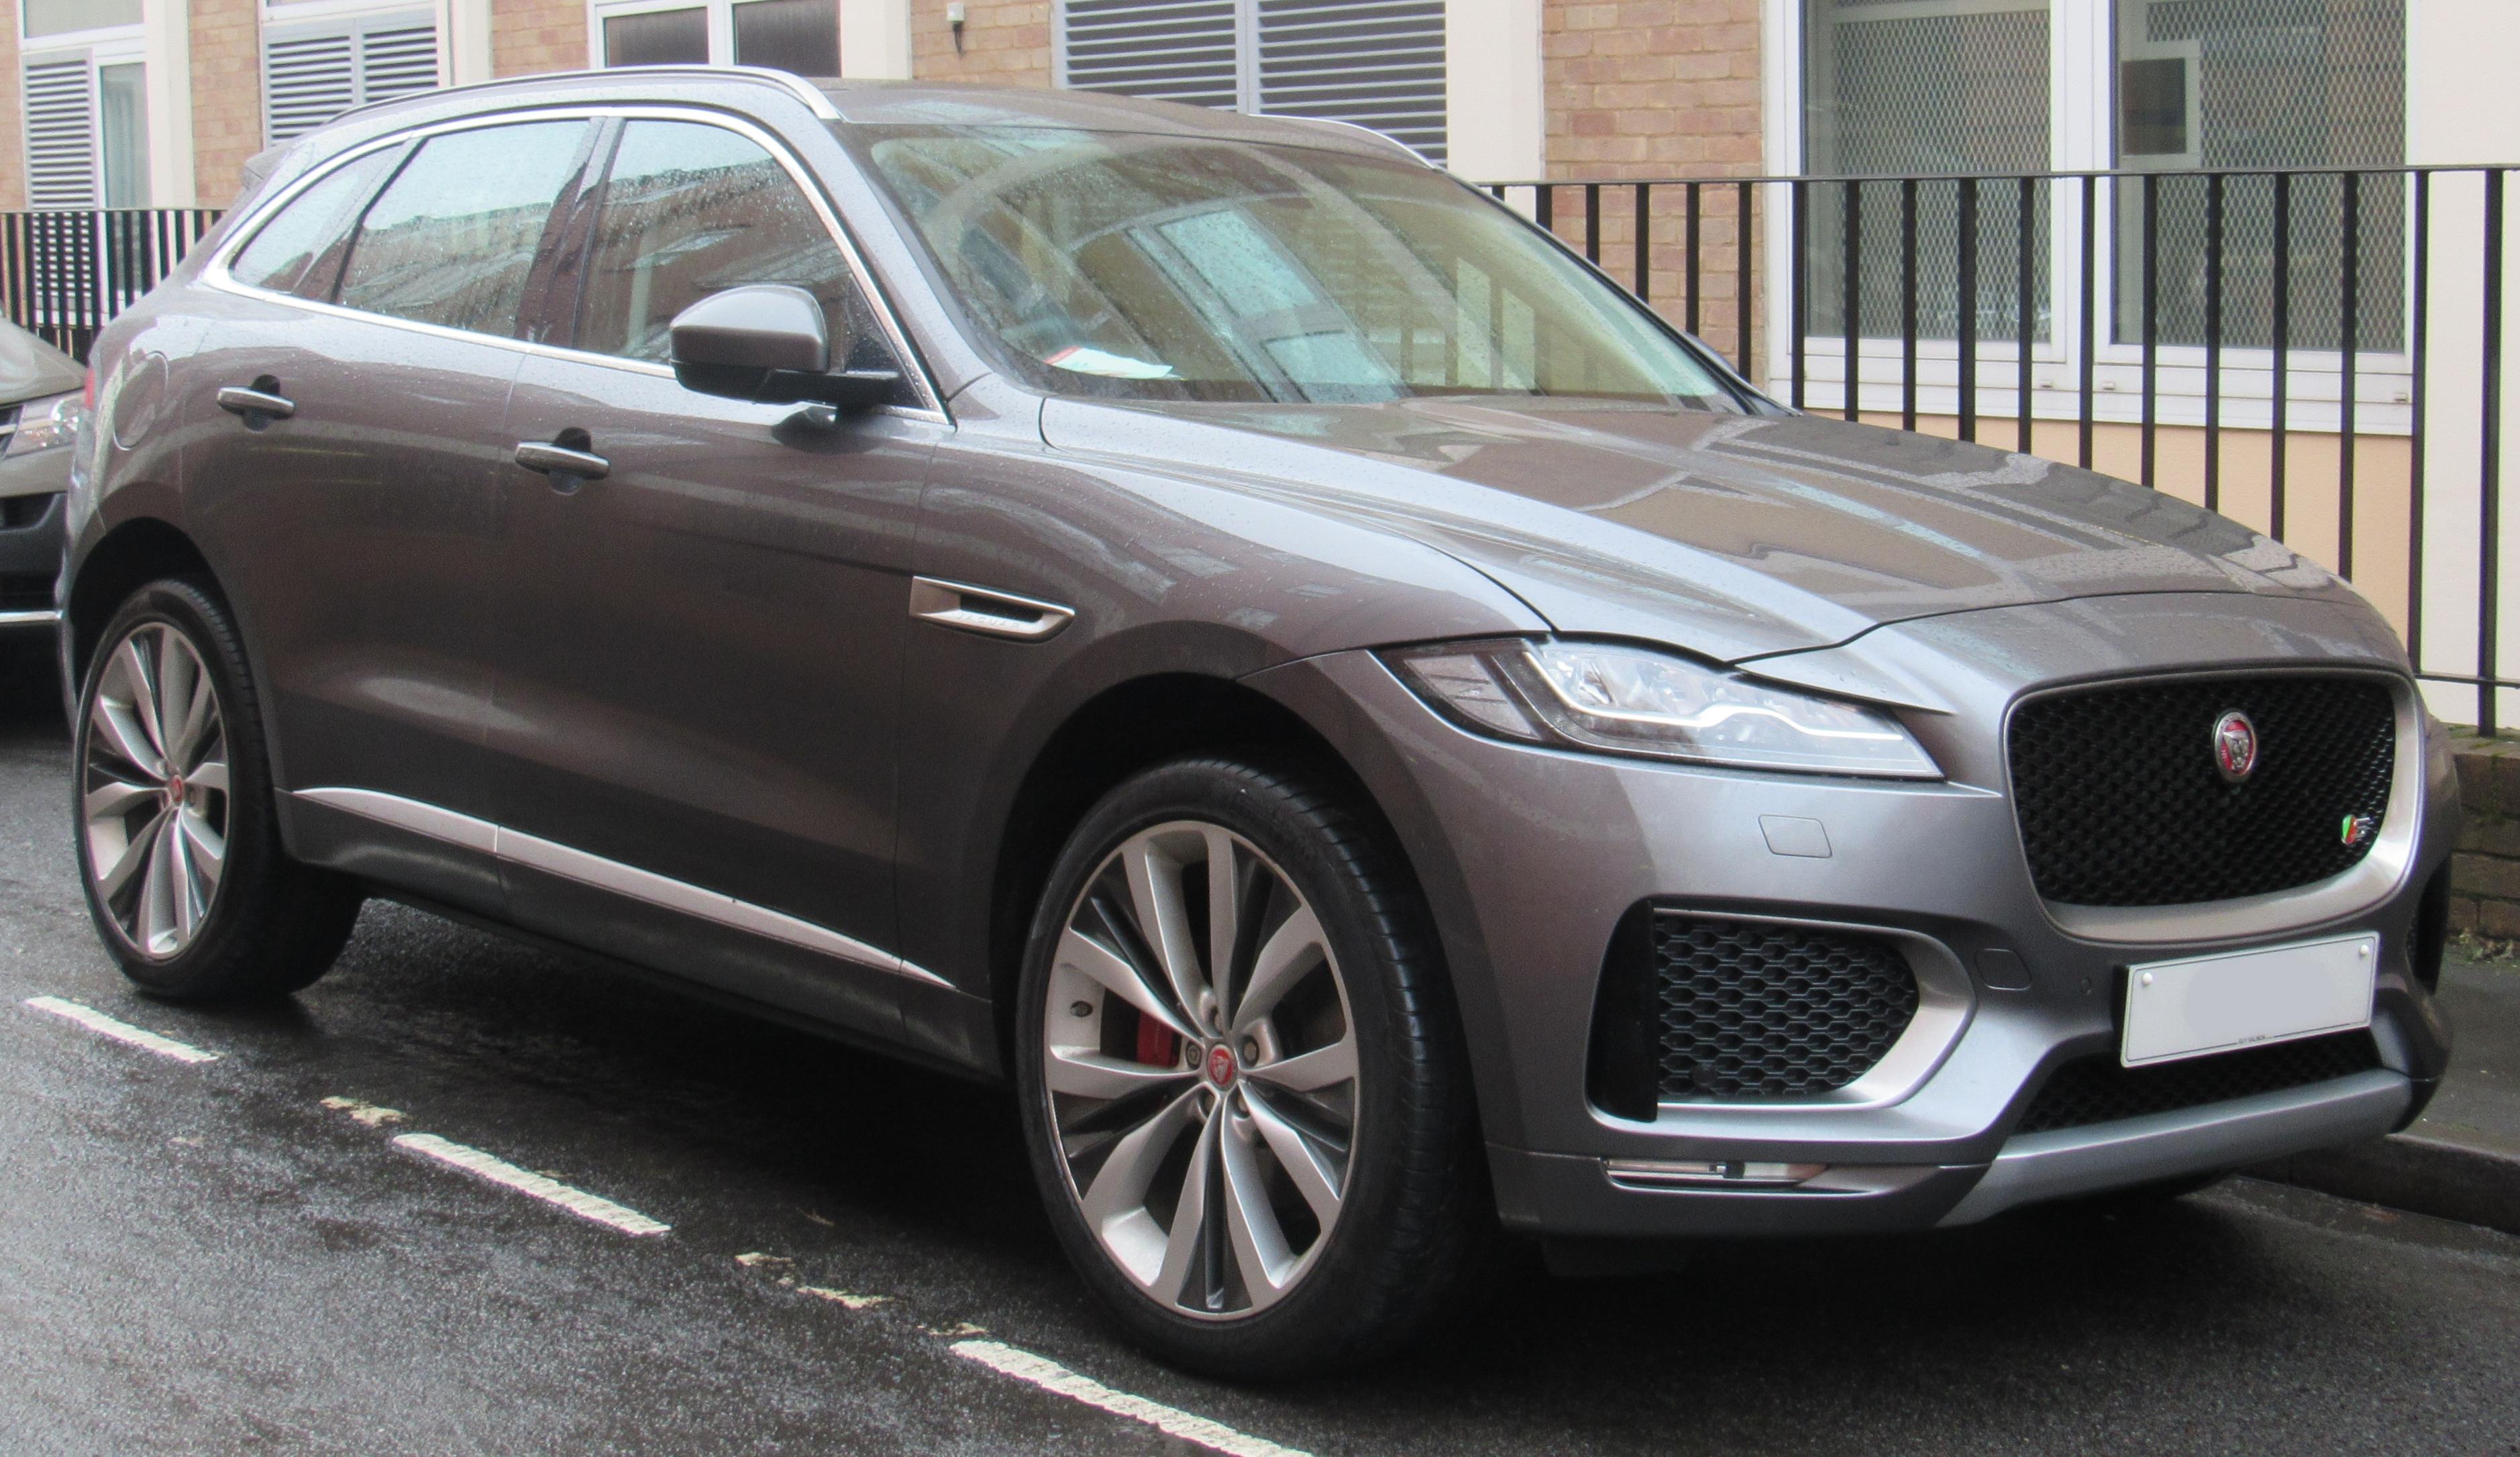 Jaguar Cars Wikiwand